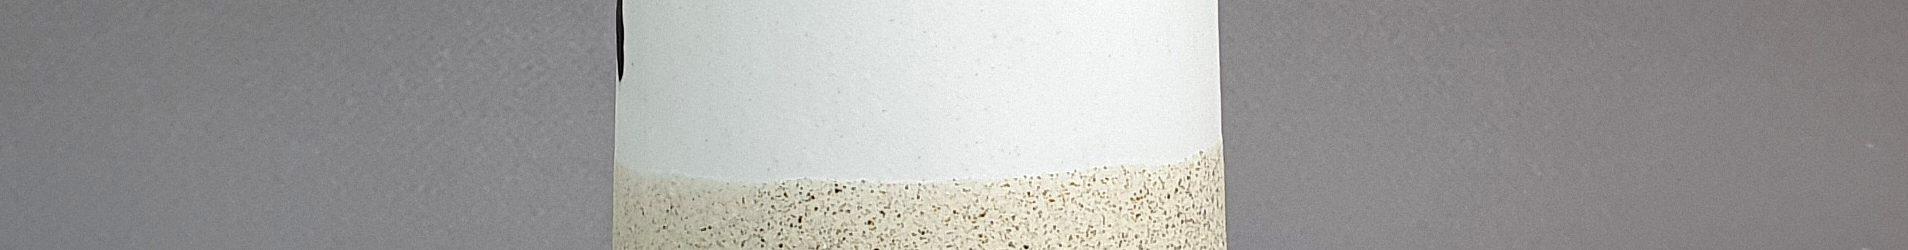 Gingko Jug 21 x 8.5 cm